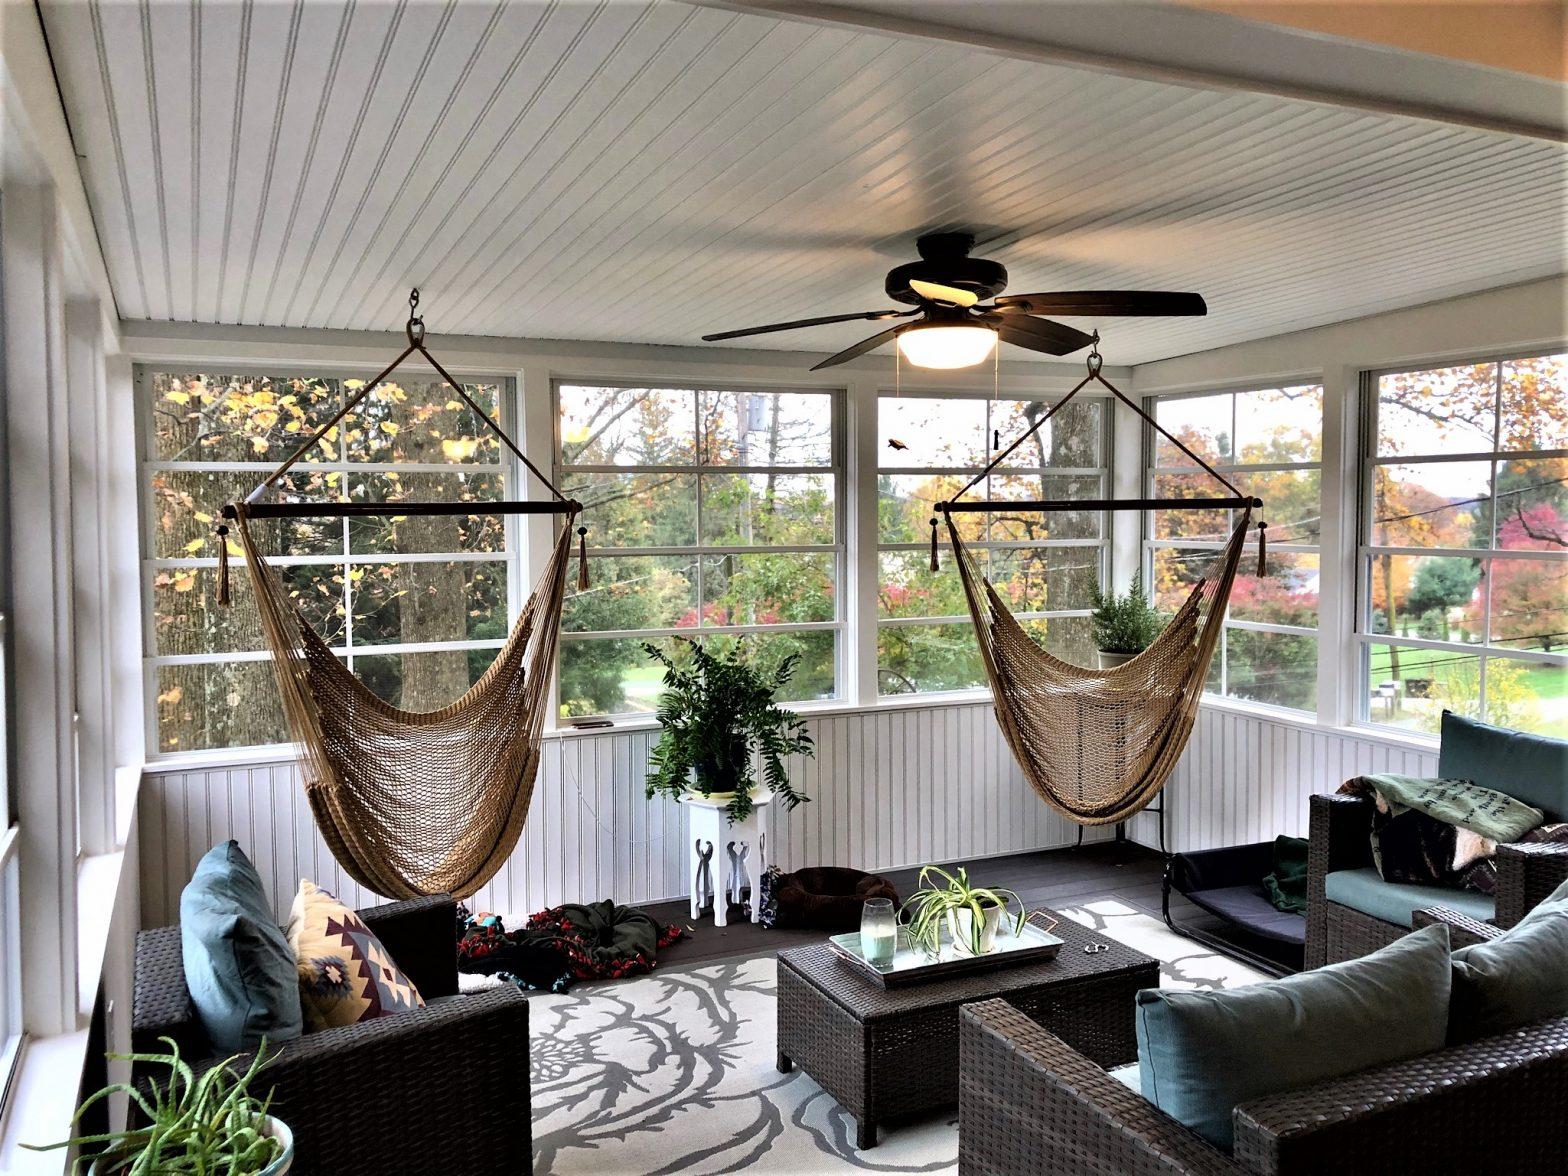 Sun room with 2 hammocks, a fan, and wicker furniture